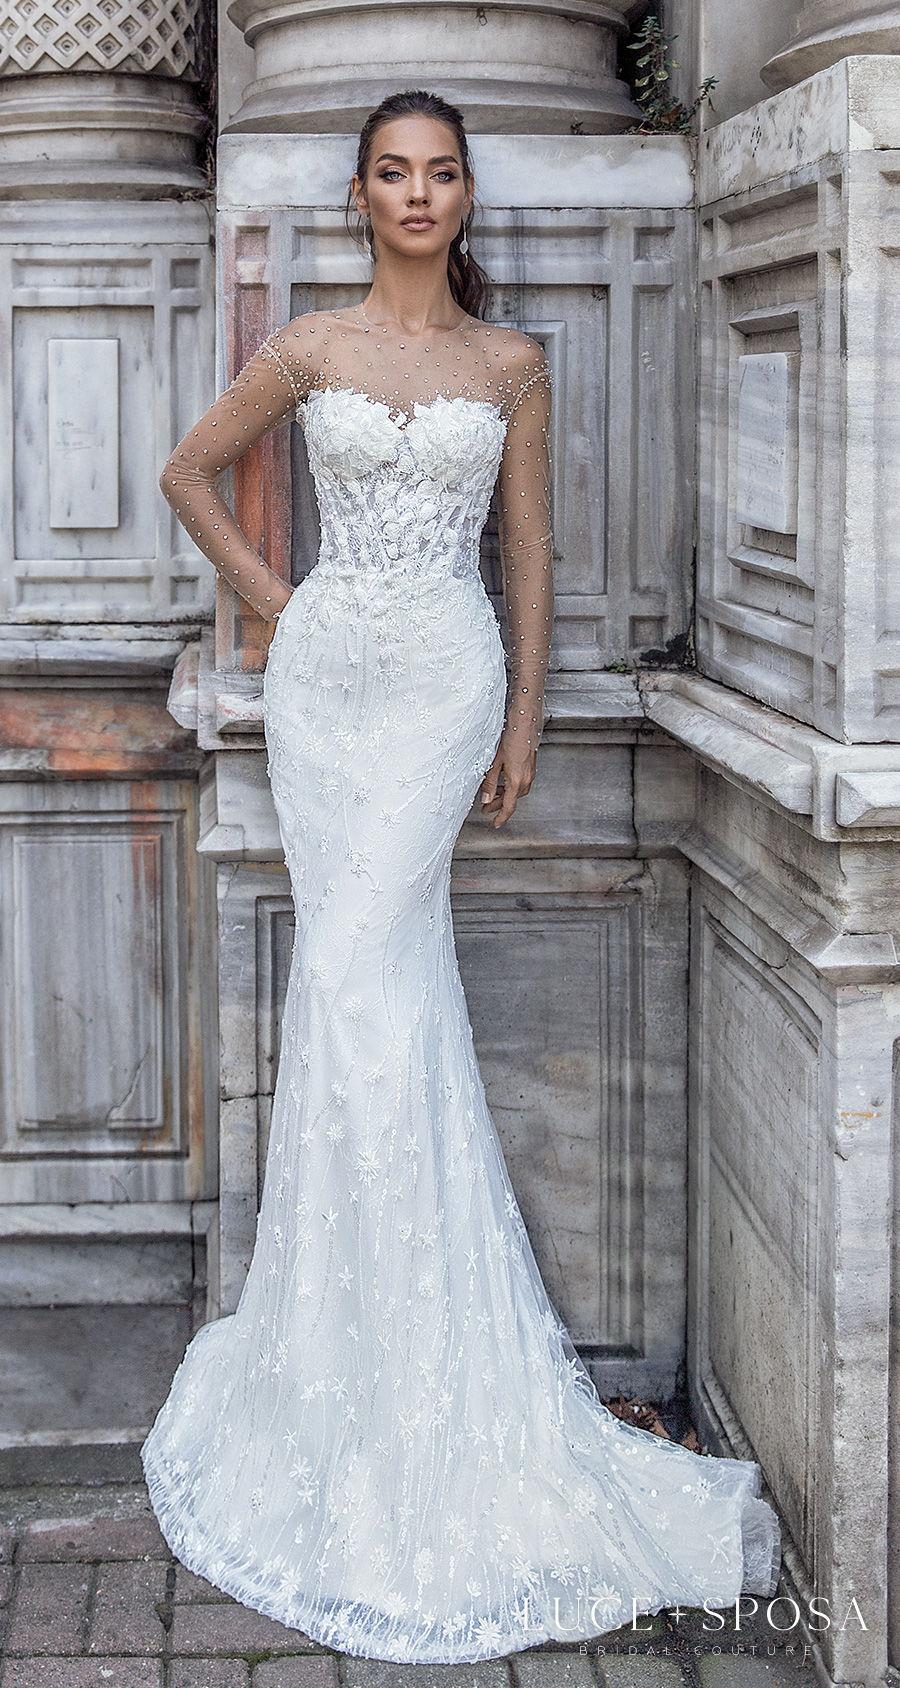 luce sposa s2021 istanbul bridal sheer long sleeves illusion jewel sweetheart neckline full embellishment elegant sheath wedding dress sheer button back sweep train (amara) mv